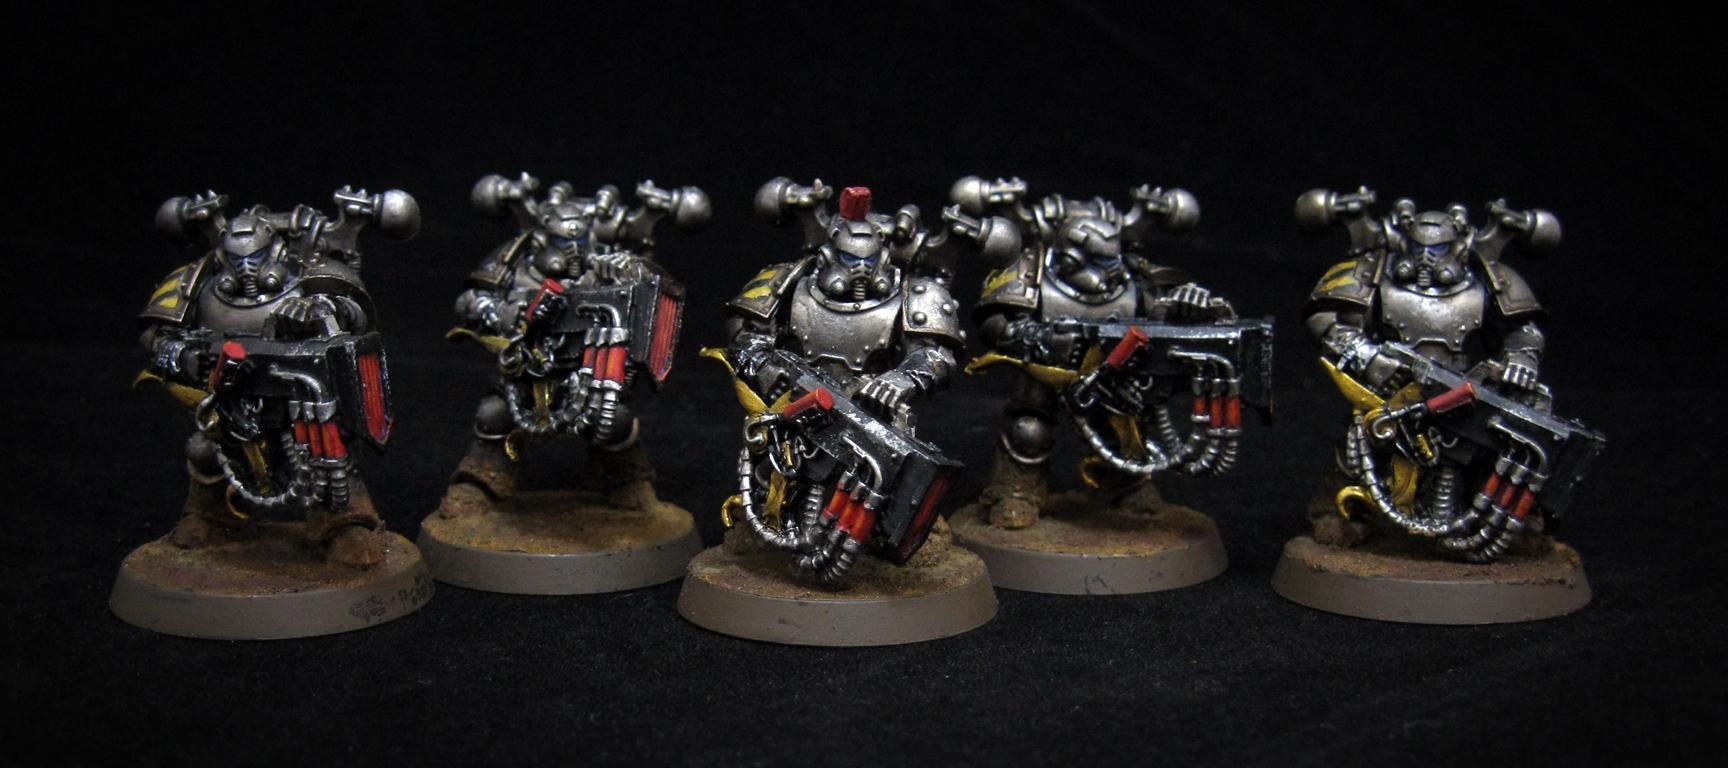 Conversion, Horus Heresy, Iron Warriors, Kakophoni, Noise Marines, Pre-heresy